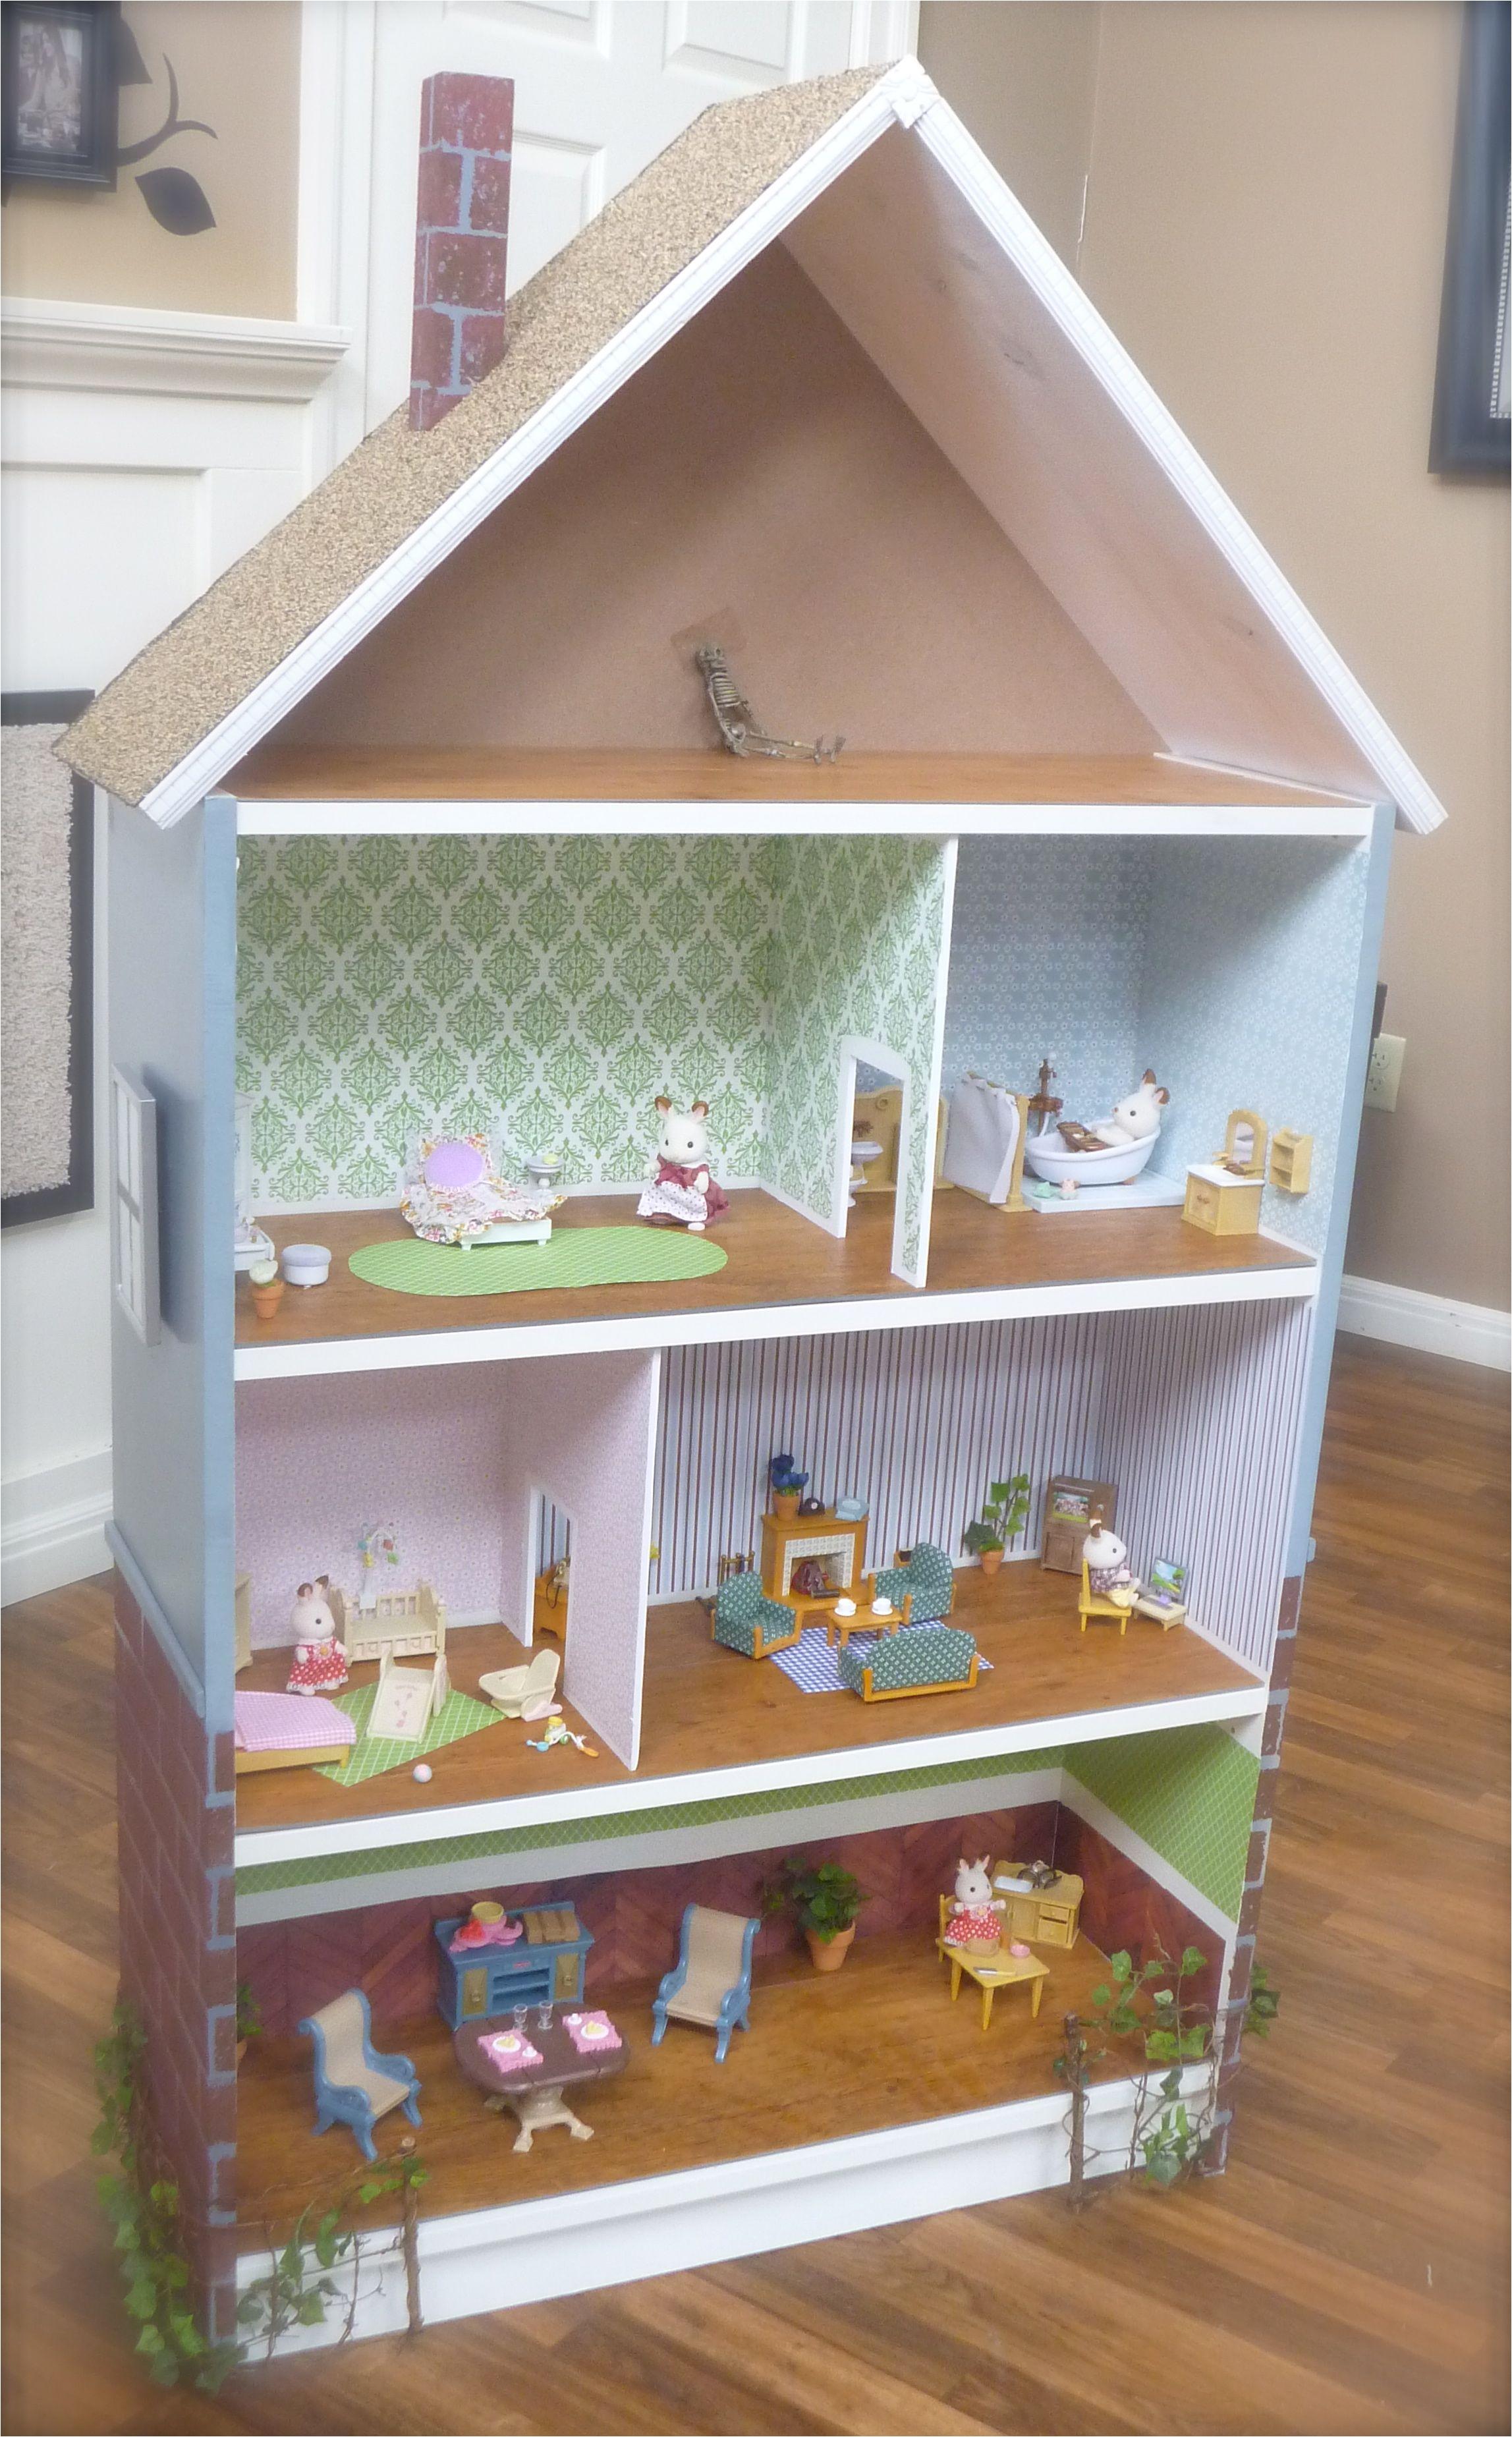 american girl dollhouse plans dolls house furniture ikea brick house hero p dolls